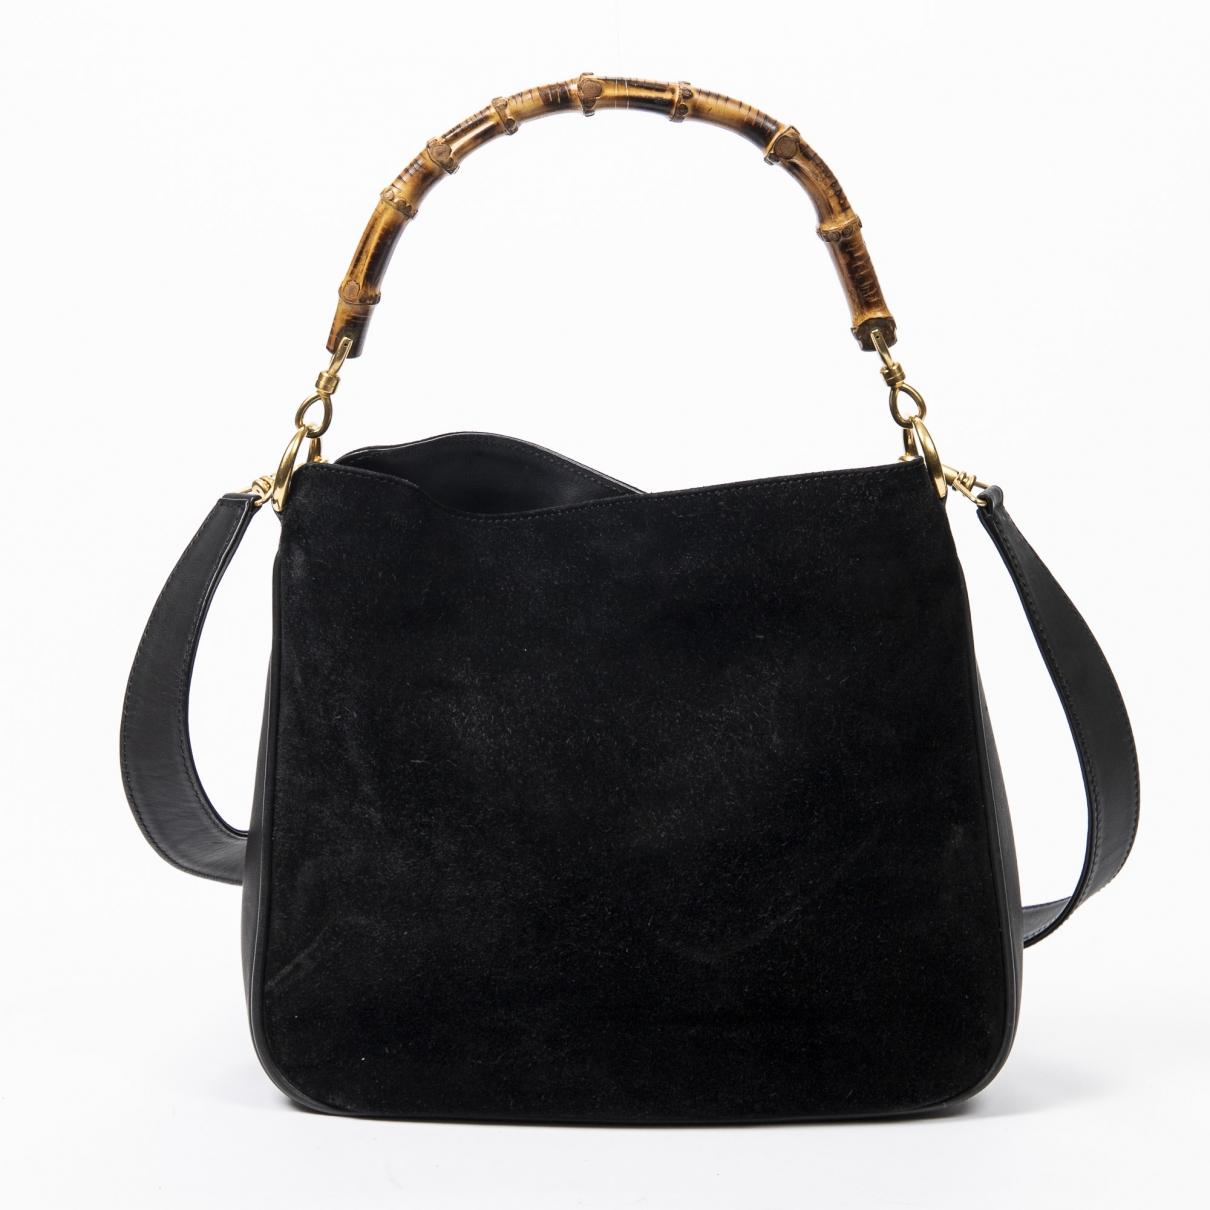 Gucci Bamboo Black Leather handbag for Women \N